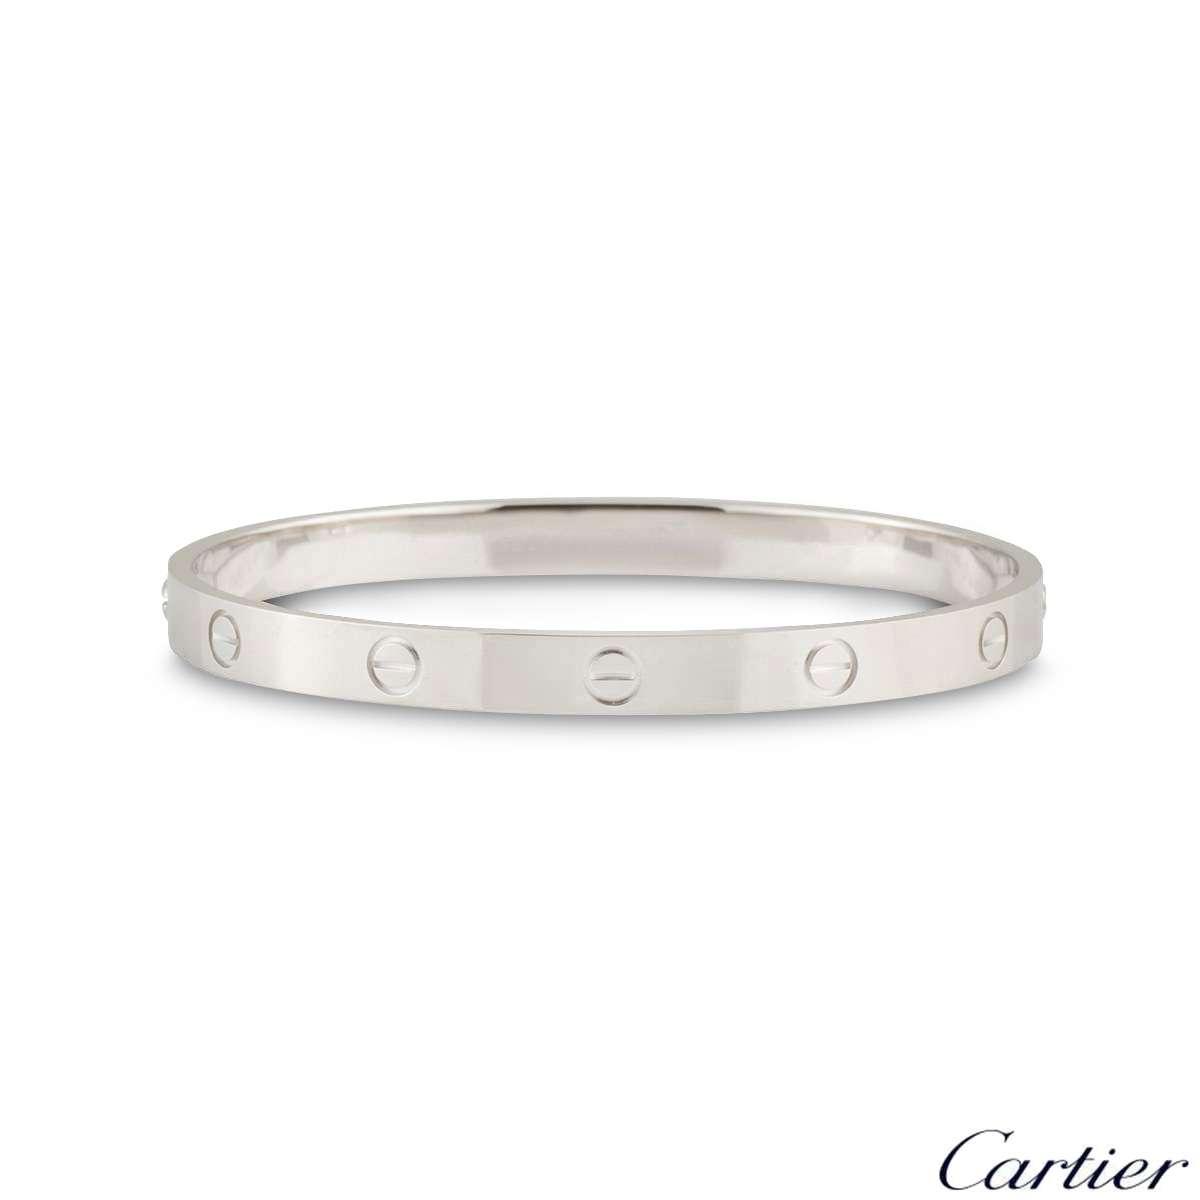 Cartier White Gold Plain Love Bracelet Size 20 B6035420